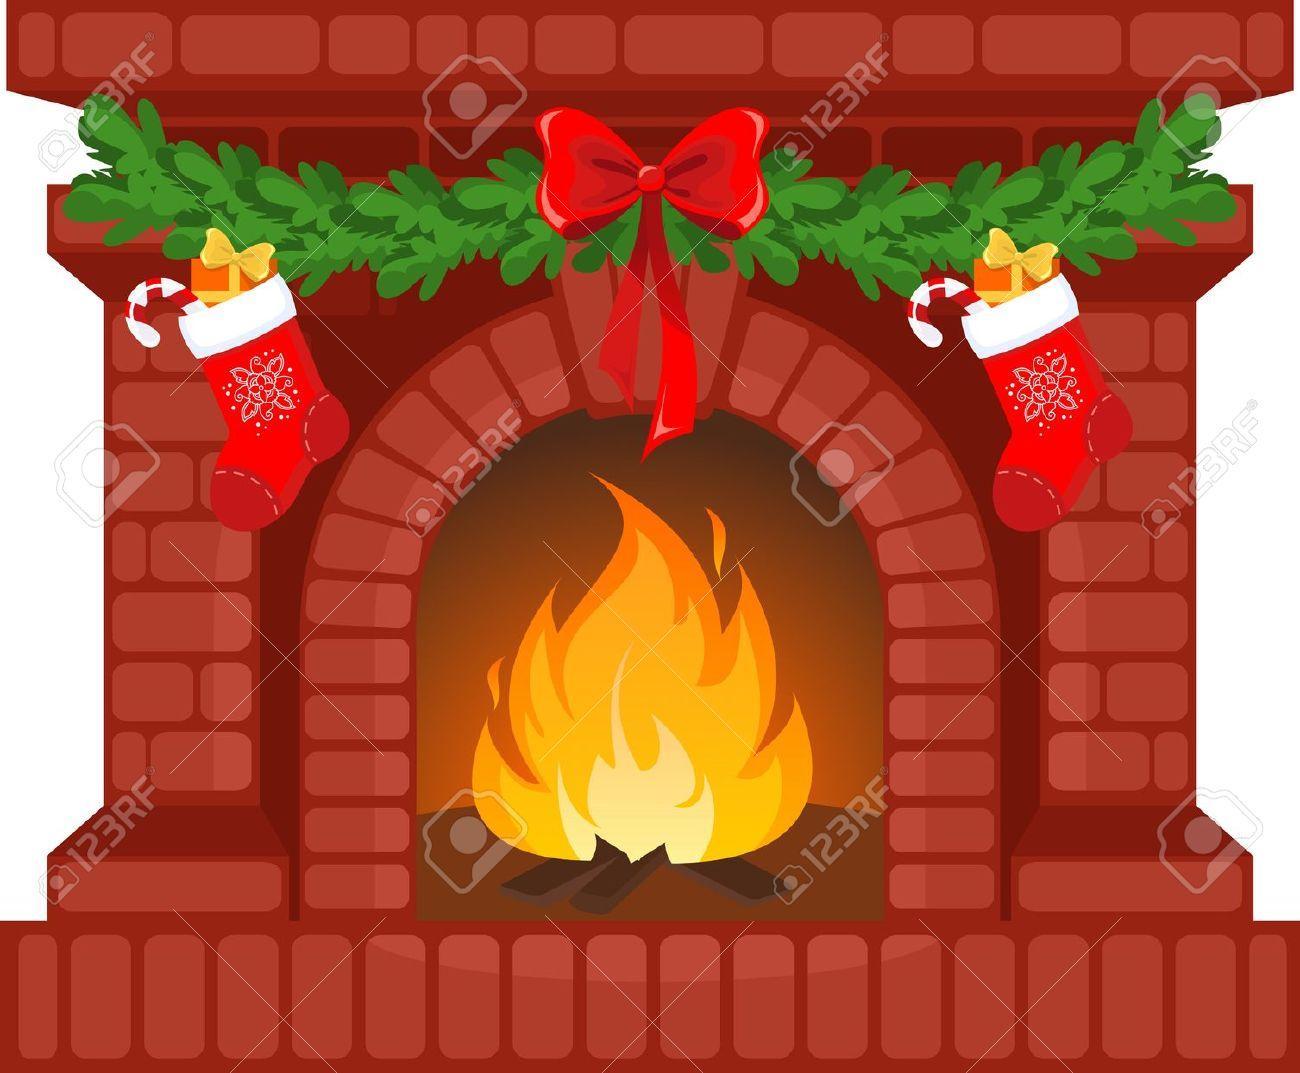 Christmas chimney clipart.